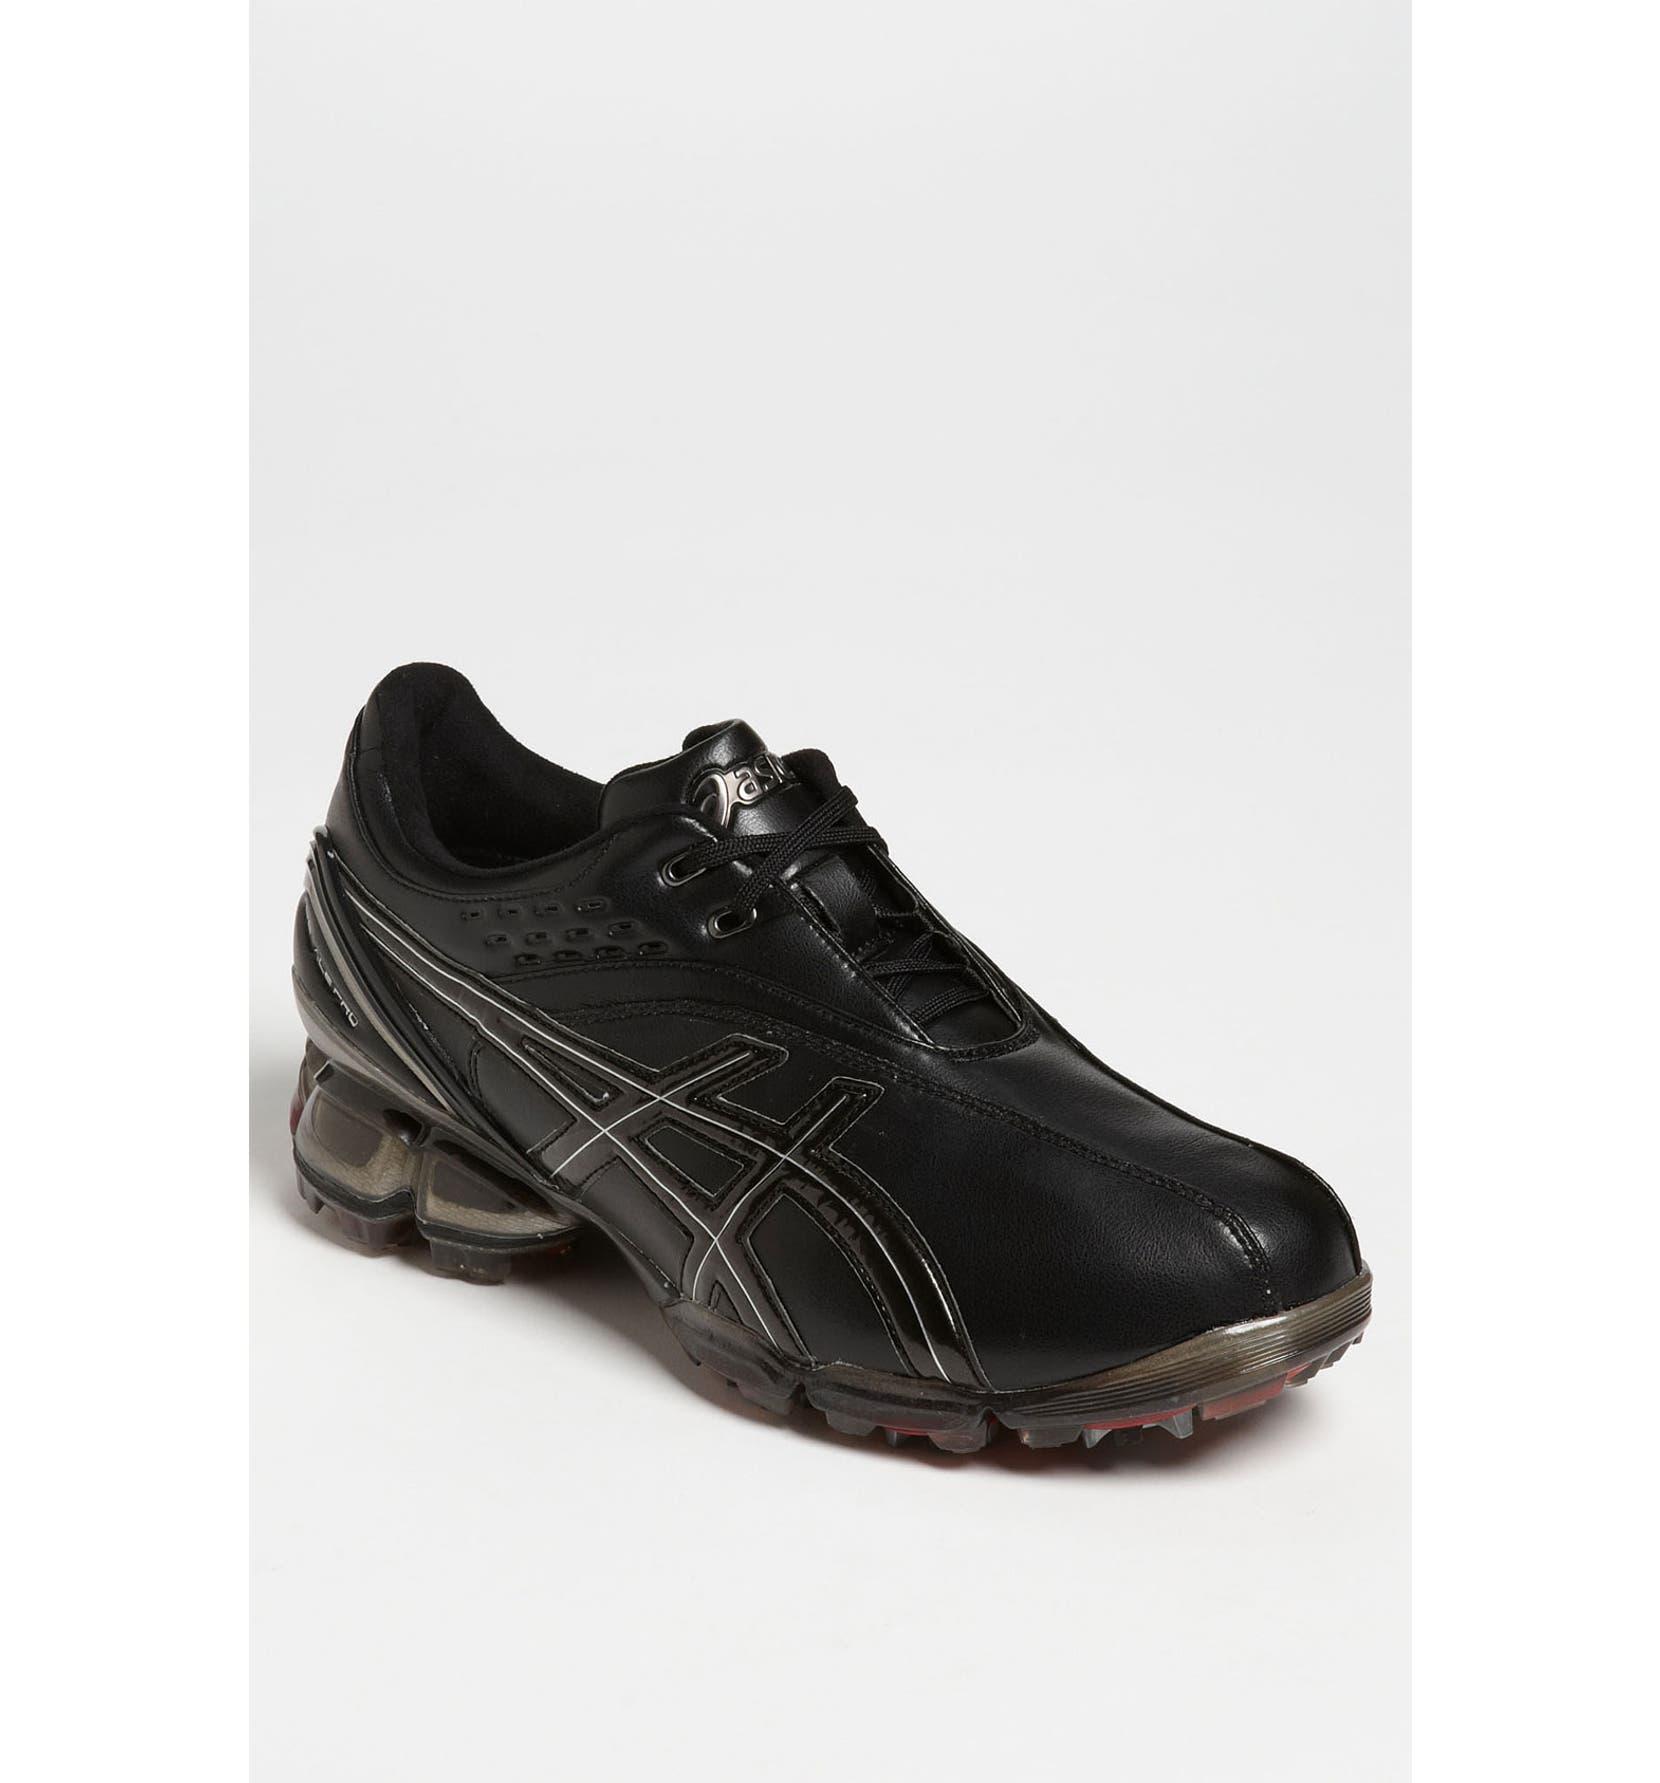 asics golf shoes men